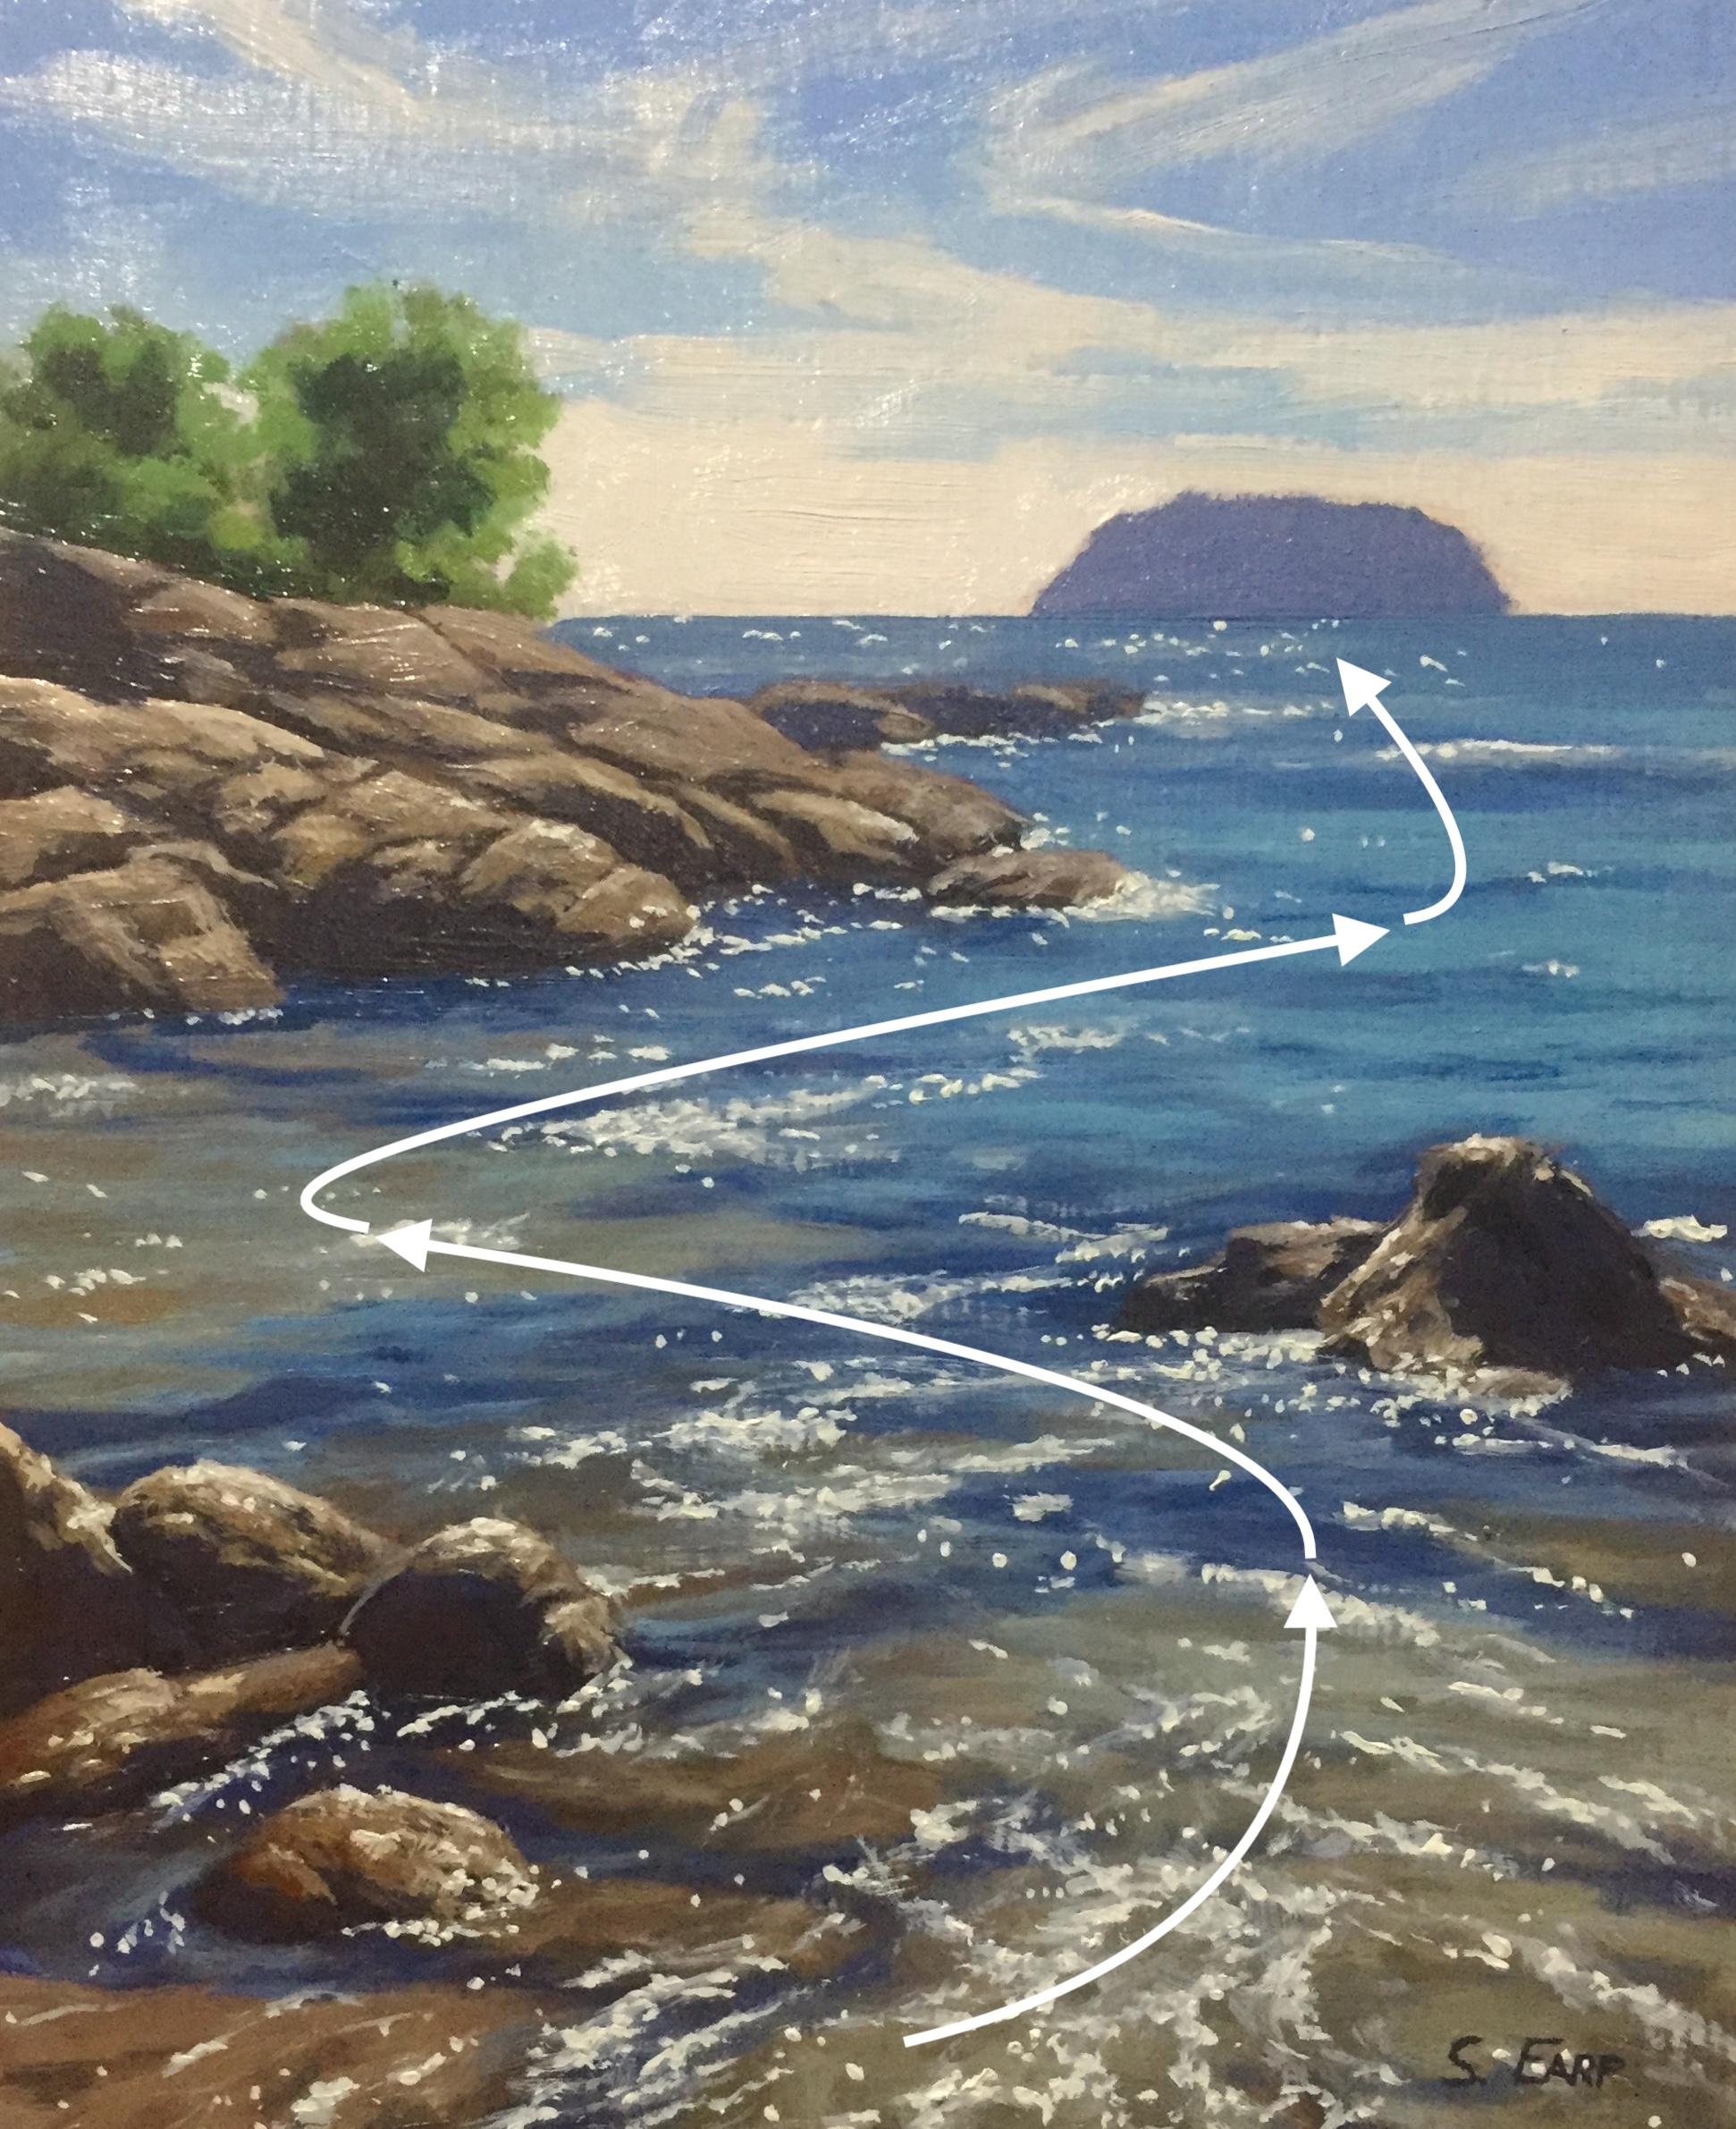 Thailand Rocky Shore - Samuel  Earp - oil painting copy.jpg